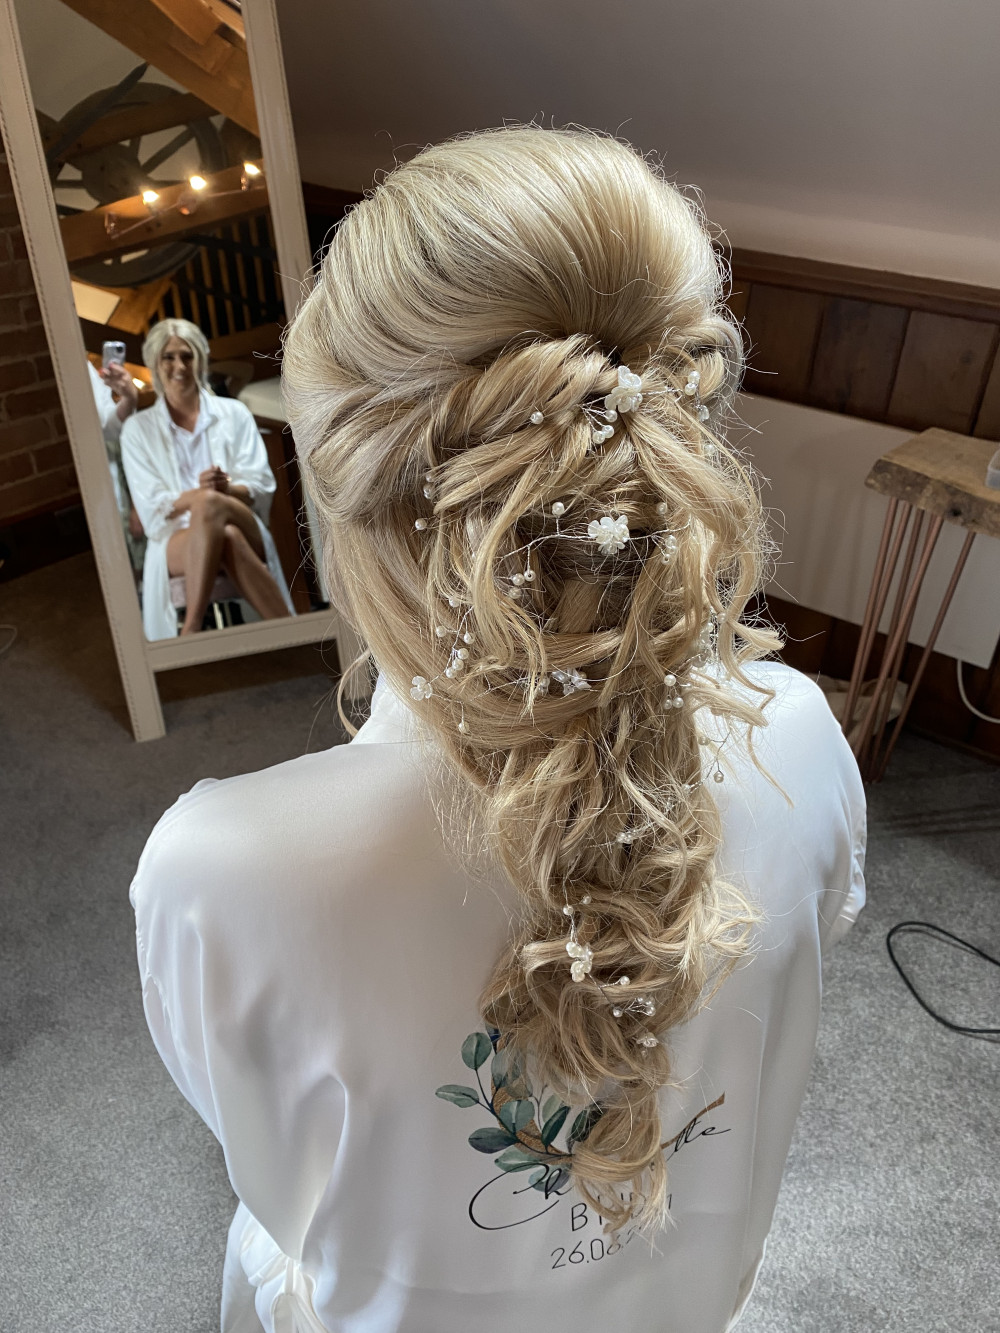 Hair by Wendy - Make Me Bridal Artist: Sapphire Styling hair and makeup . #bohemian #glamorous #blonde #bridalhair #weddinghair #mermaidbraid